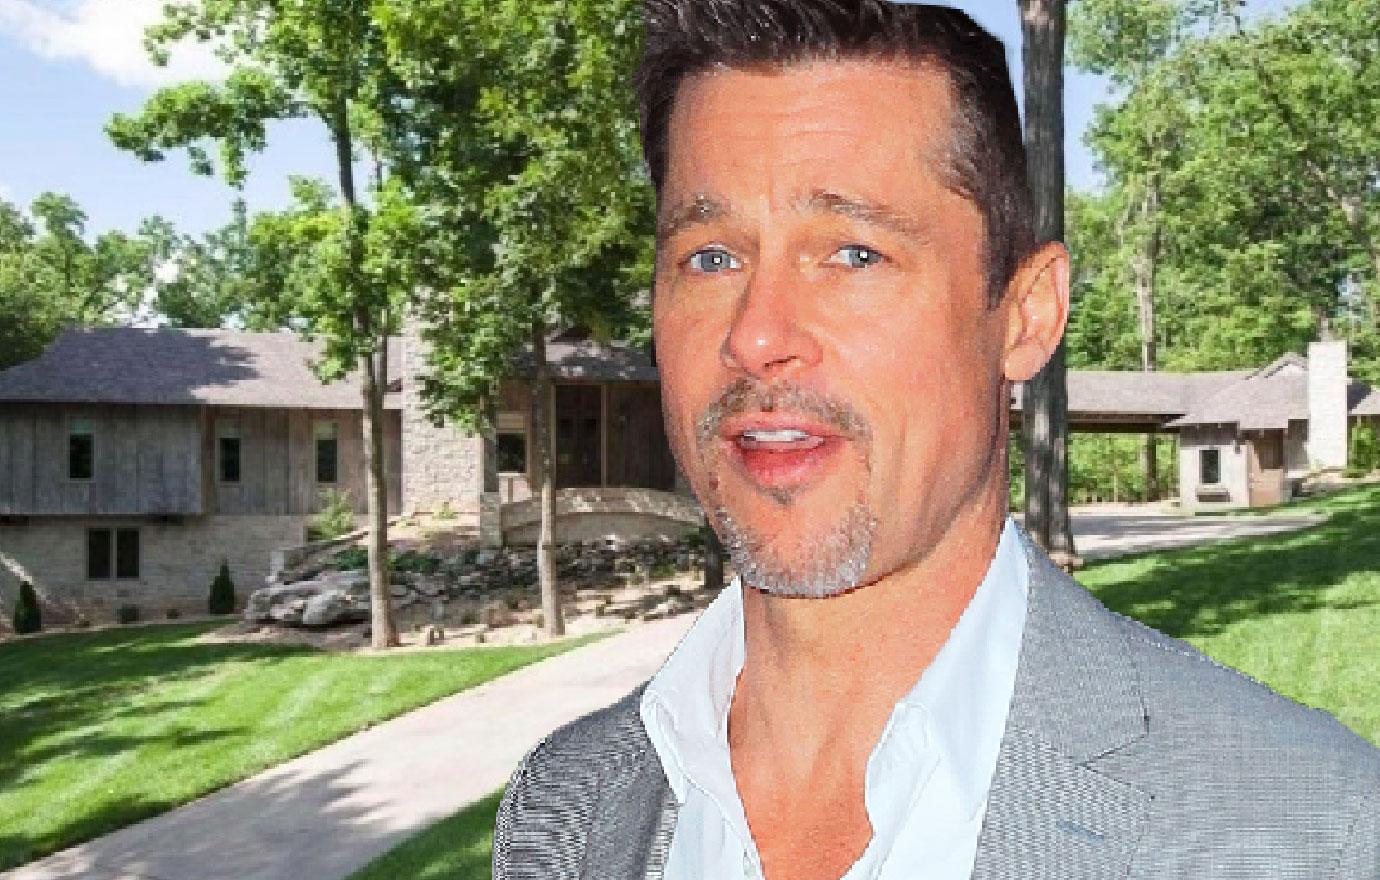 Inside Brad Pitt's Secret Compound In Springfield Missouri